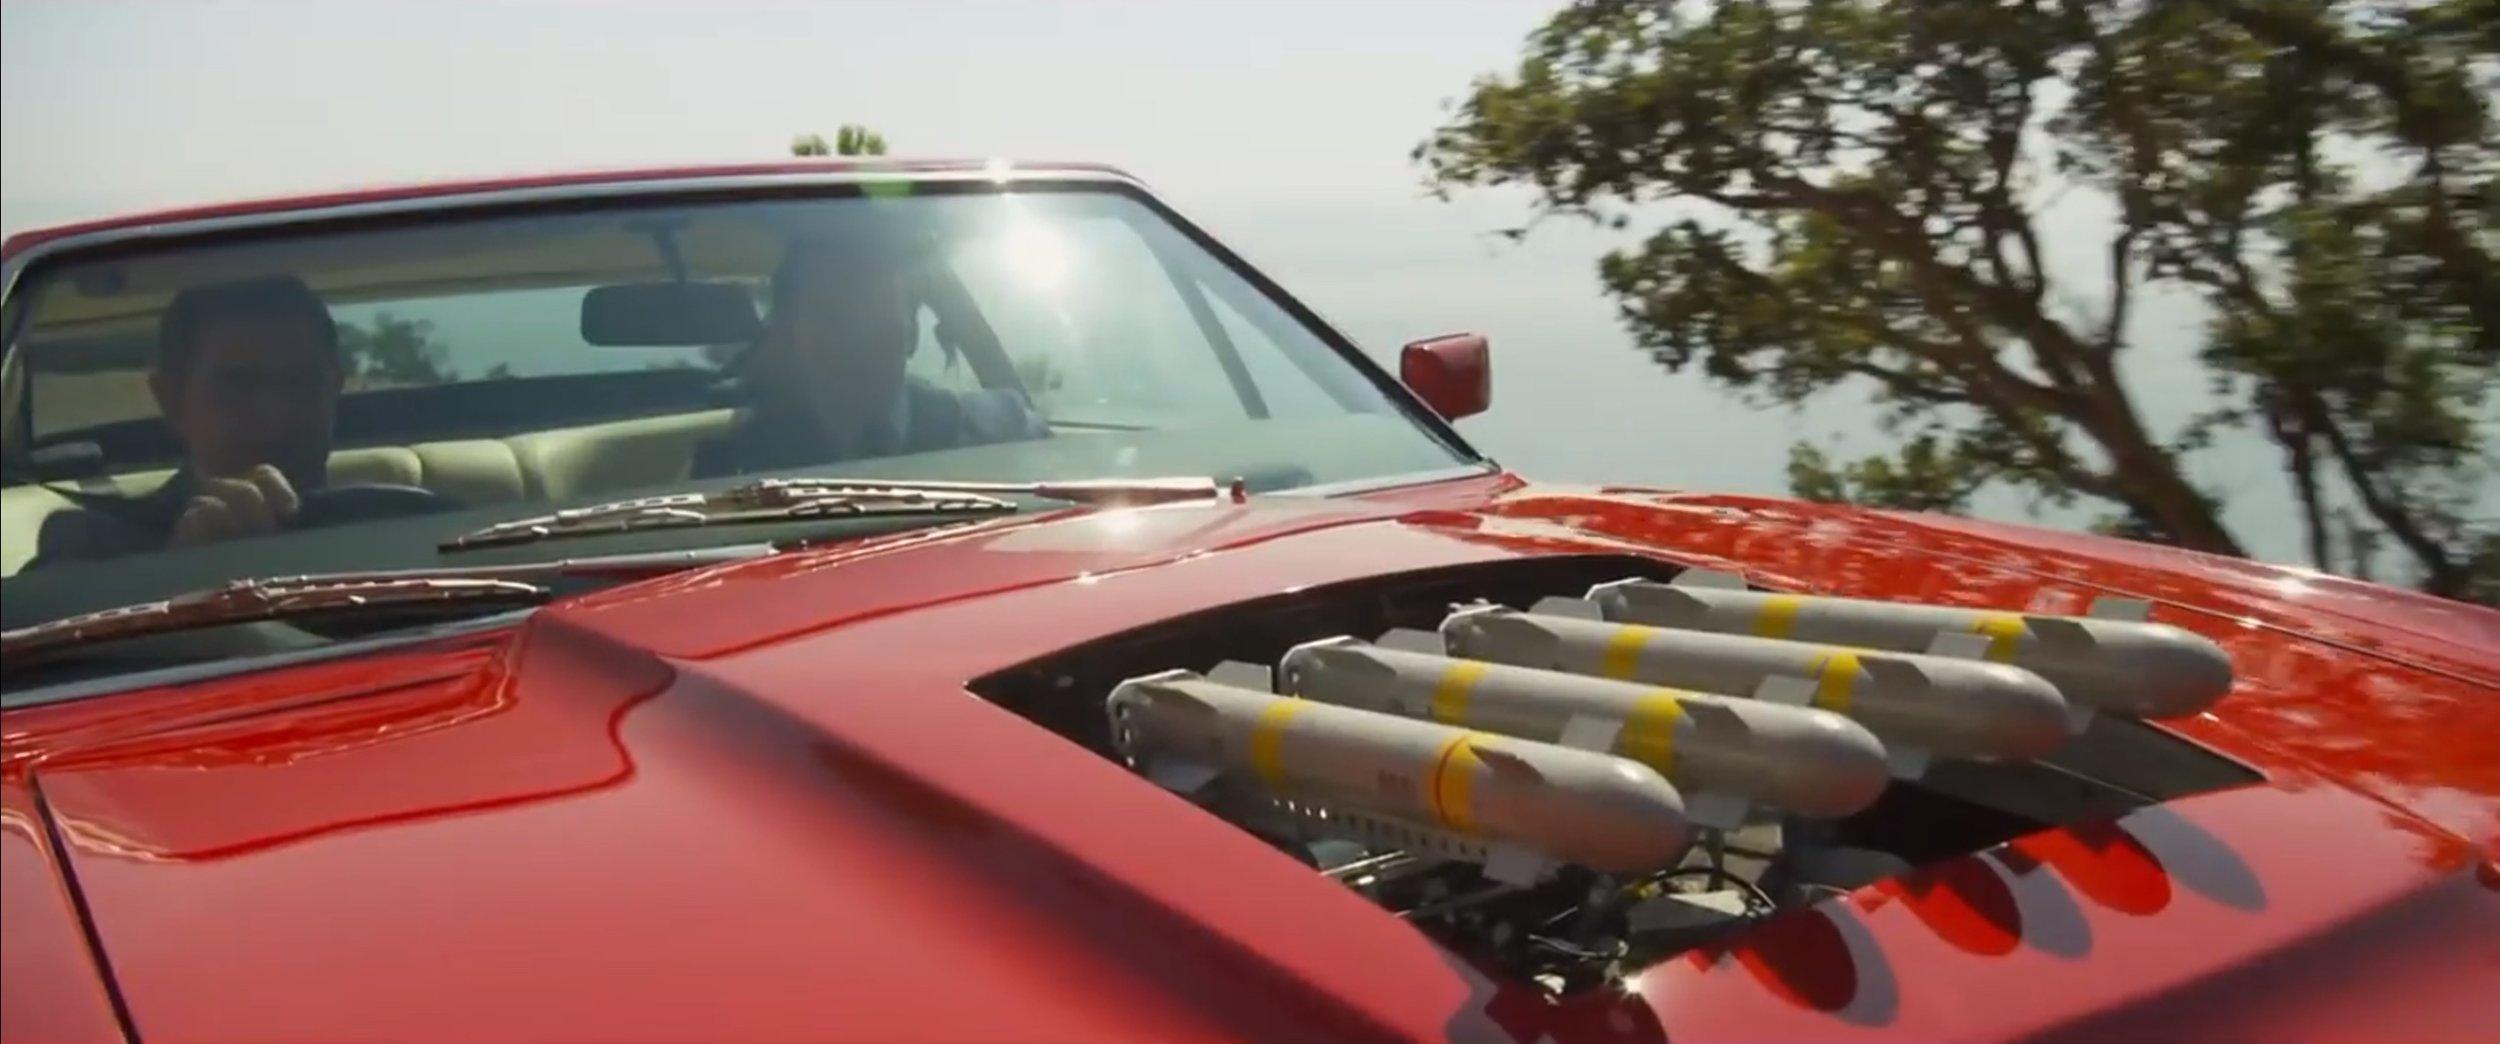 Missile rack built into an Aston Martin Vantage.